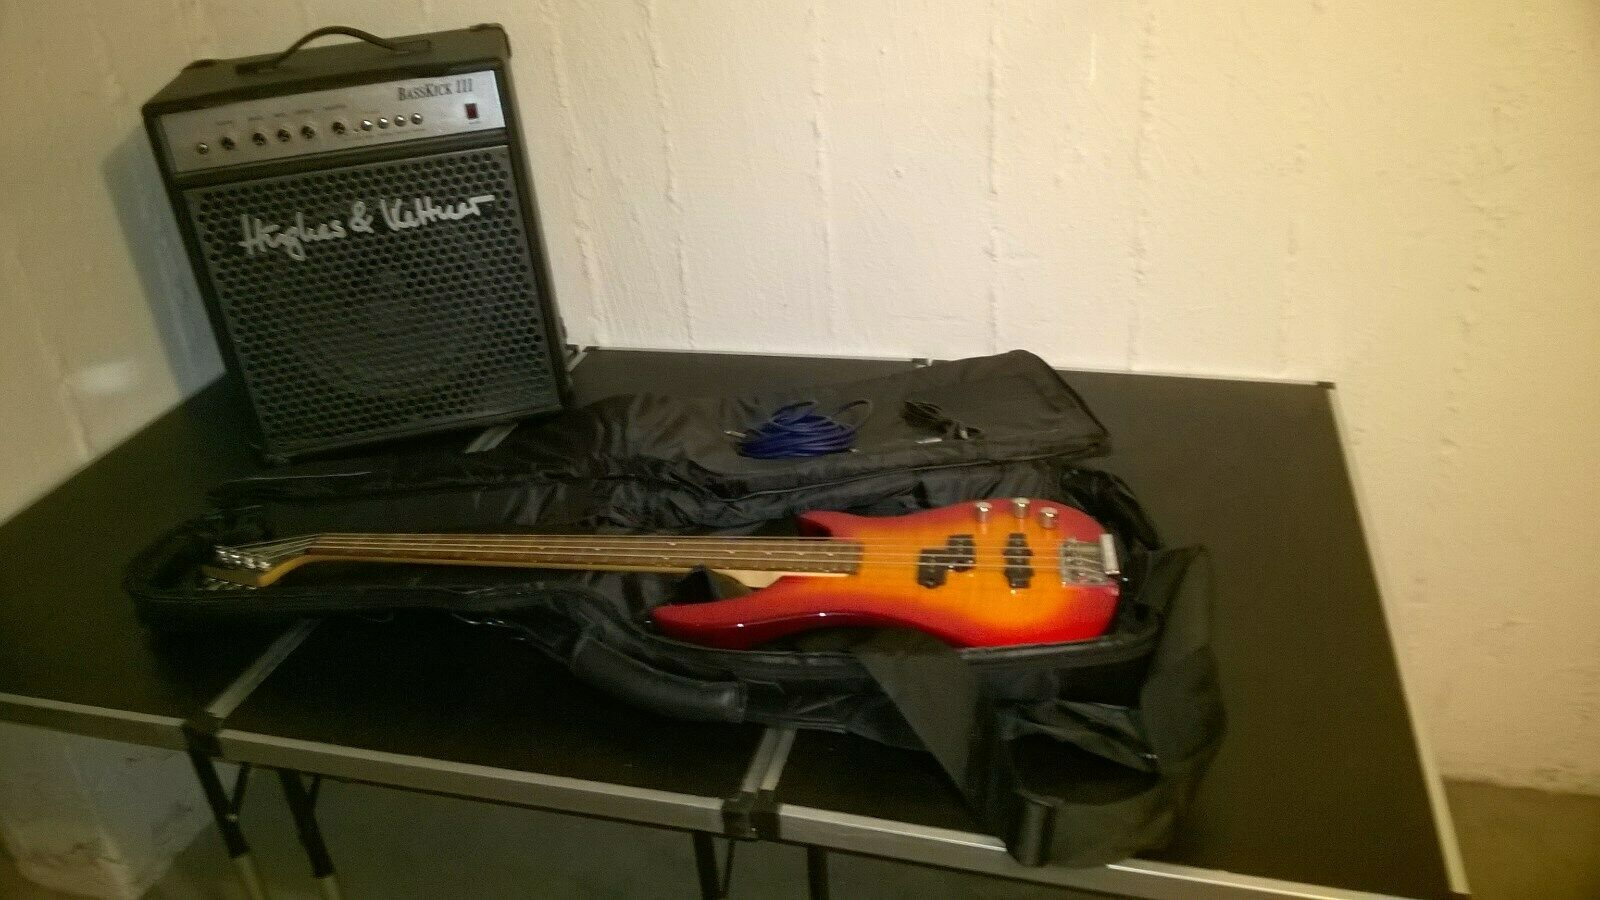 Jackson E - Gitarre plus hughes heghes